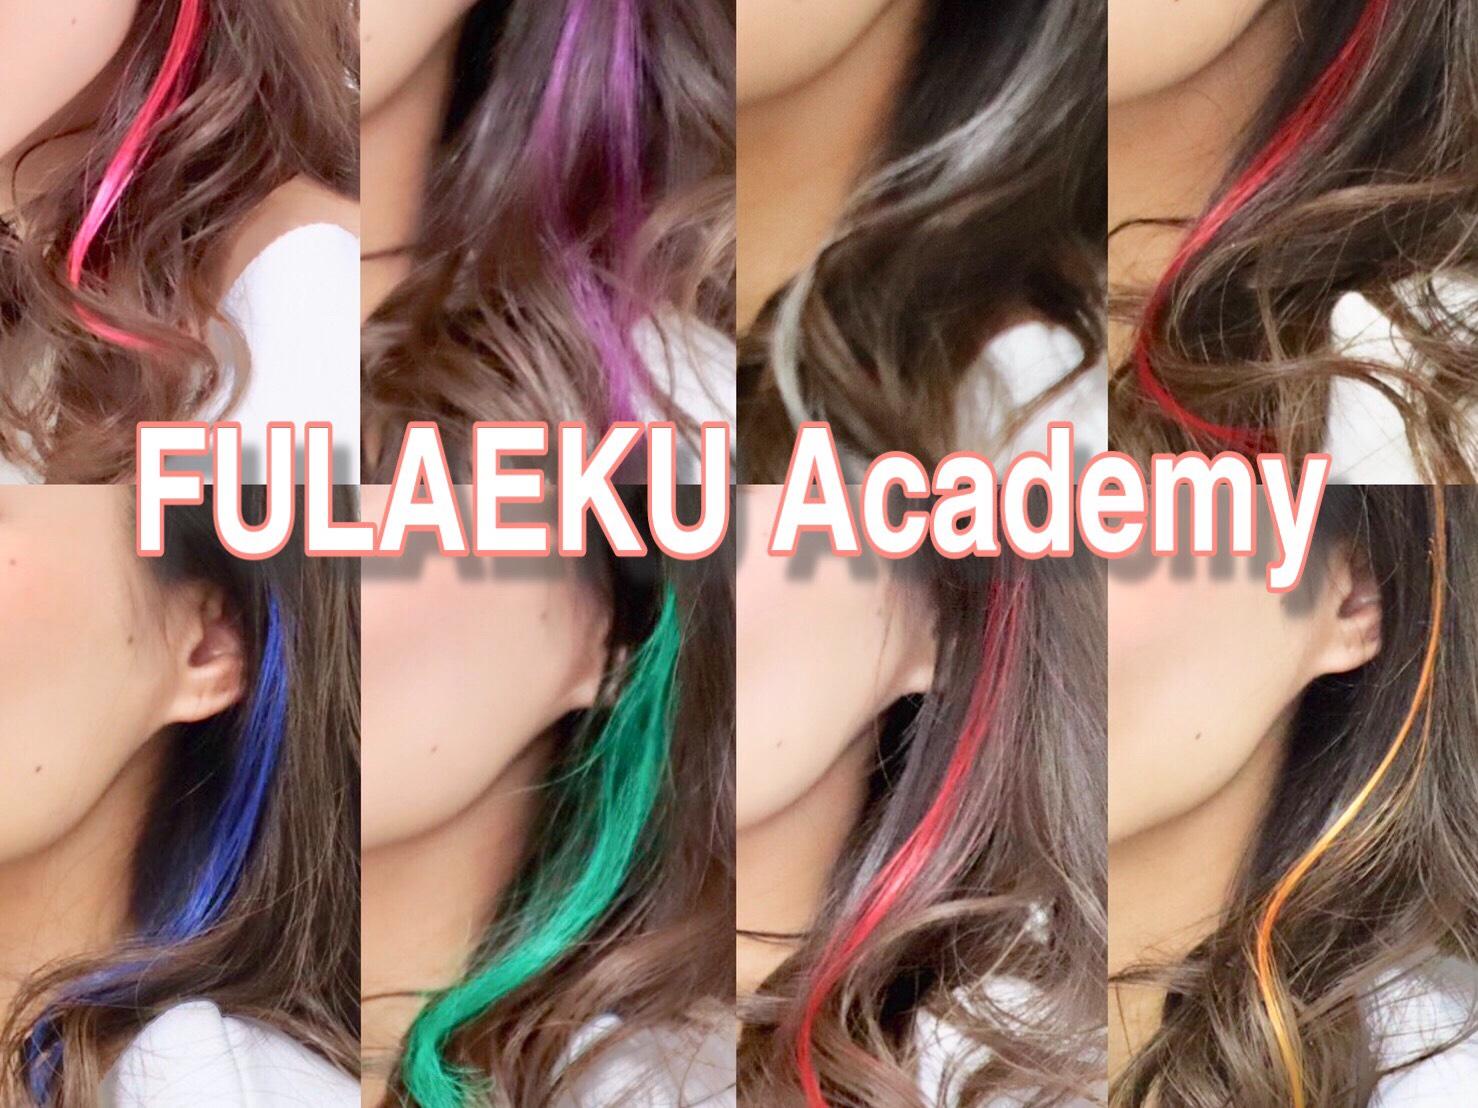 Fulaeku  Academy